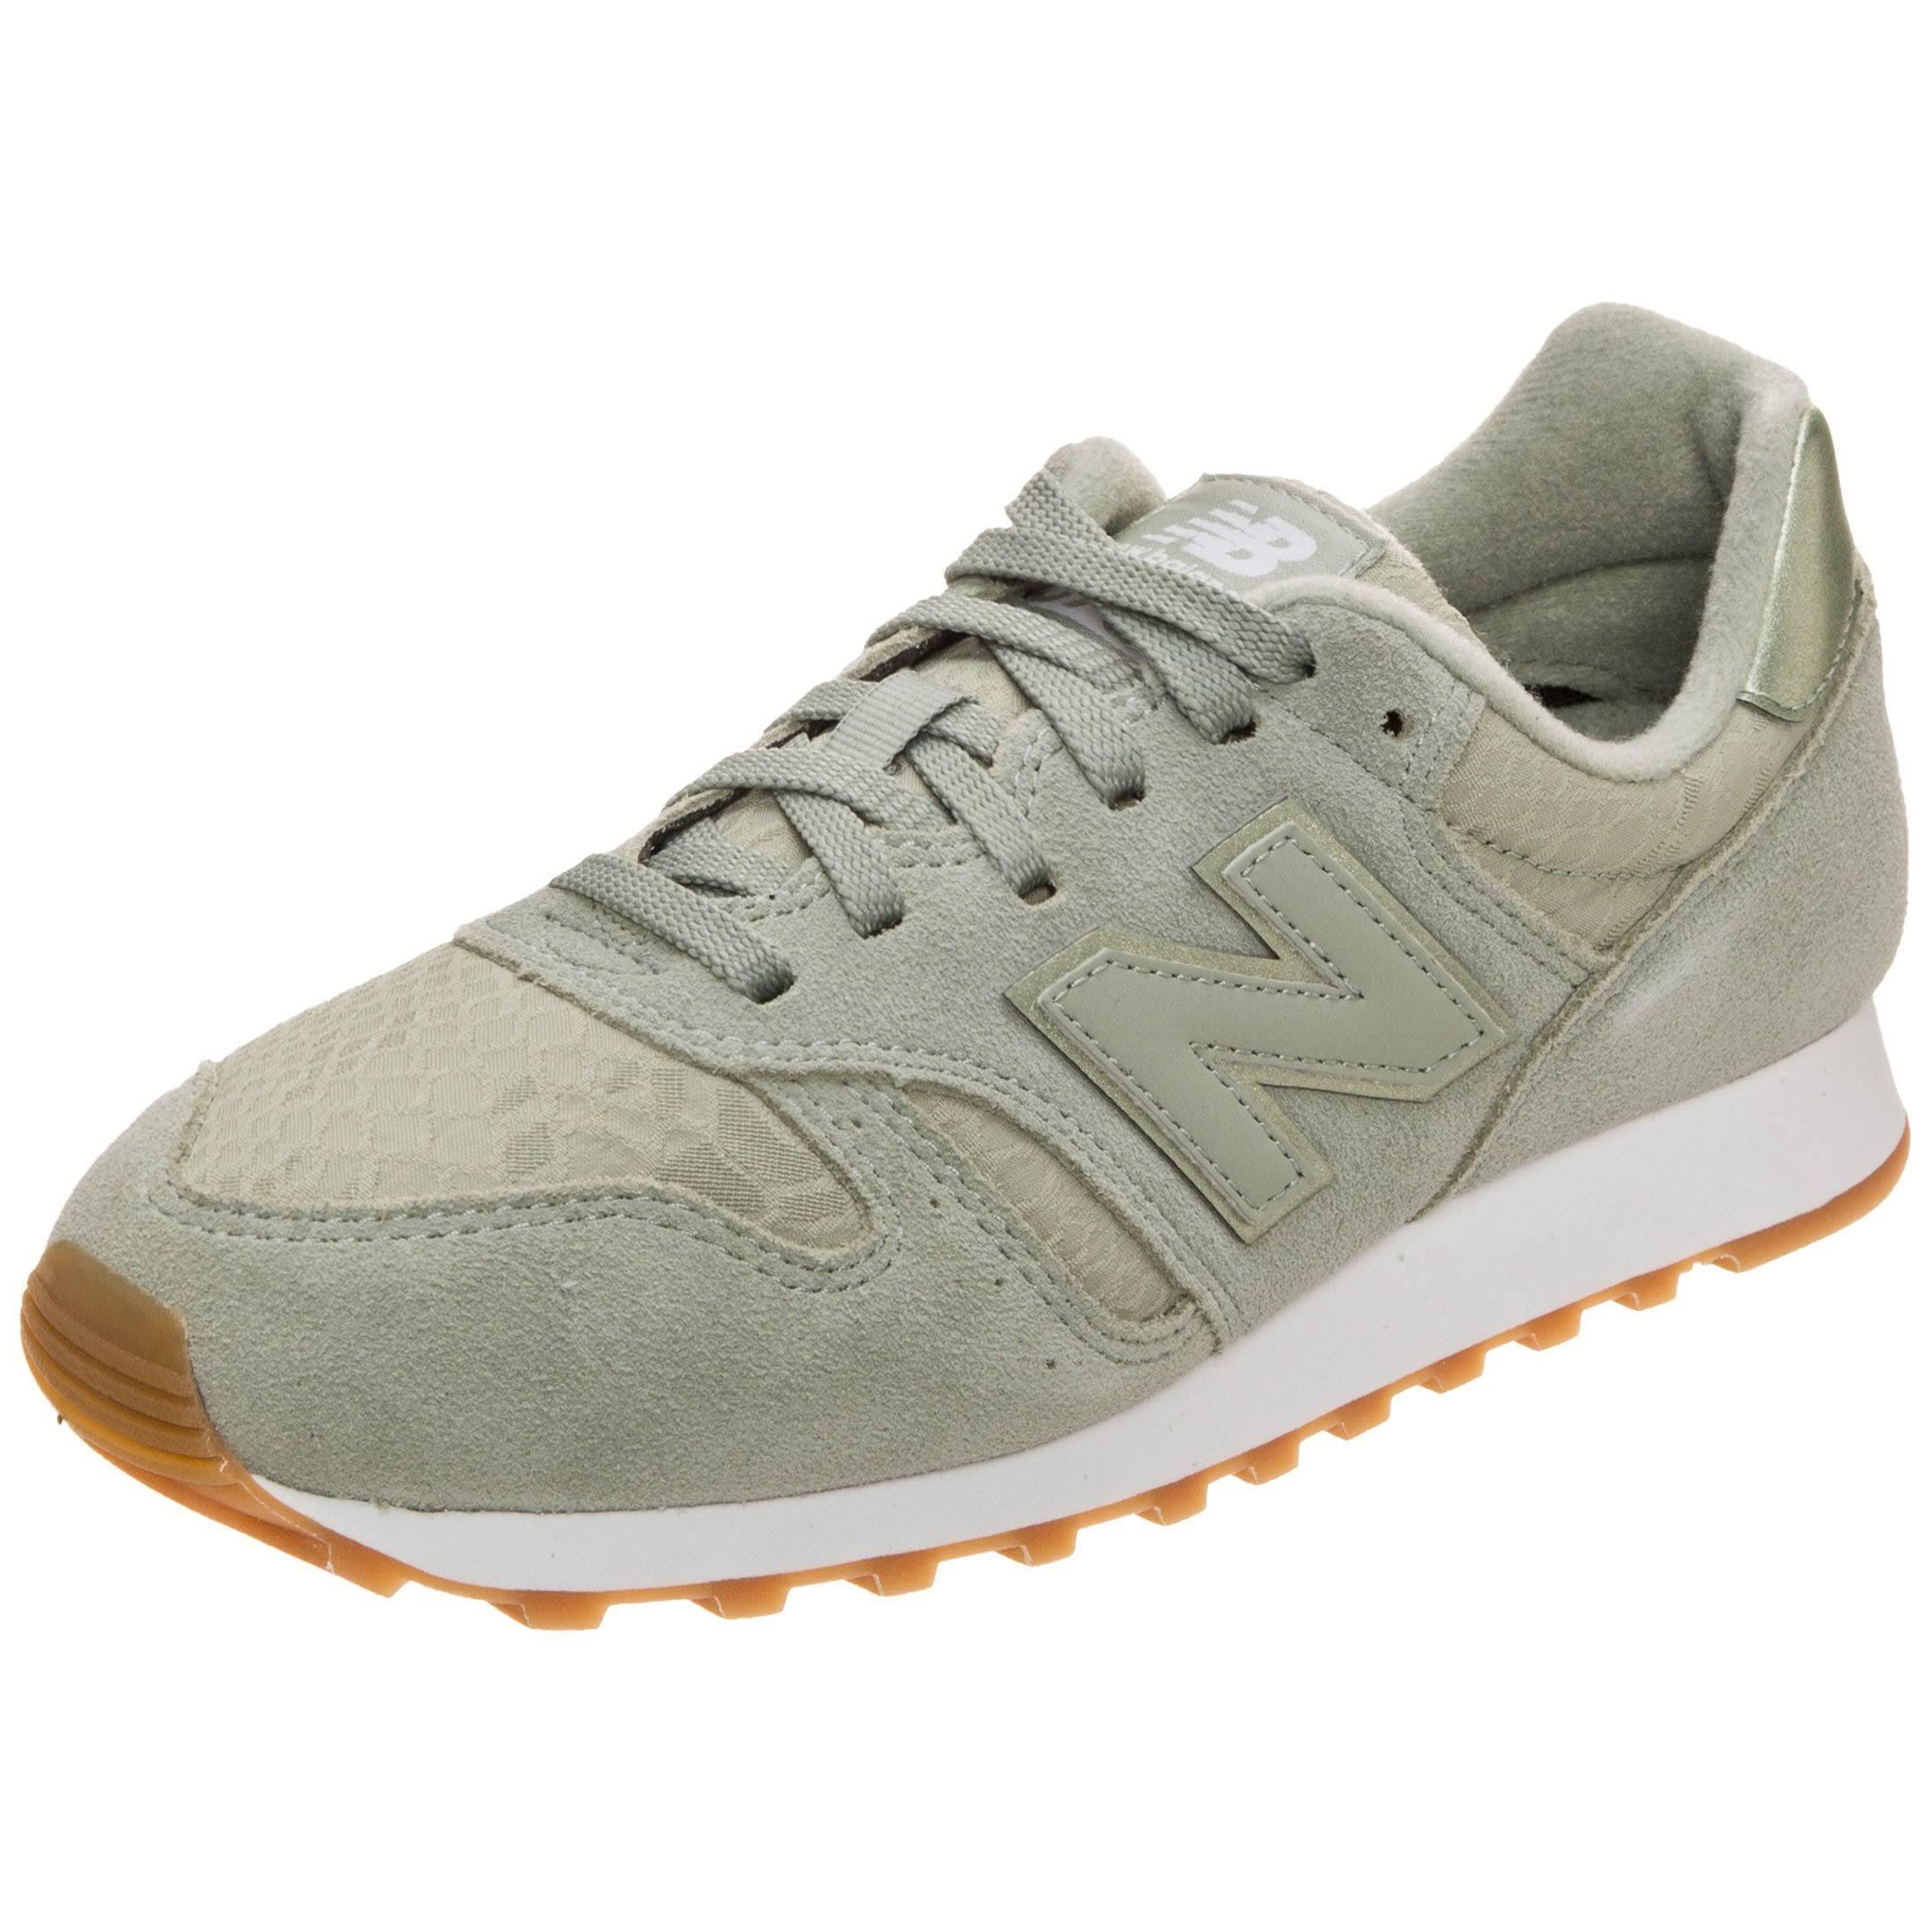 New New Balance Wl373miw Sneakersdames Balance Sneakersdames Wl373miw 7YfyvIb6mg